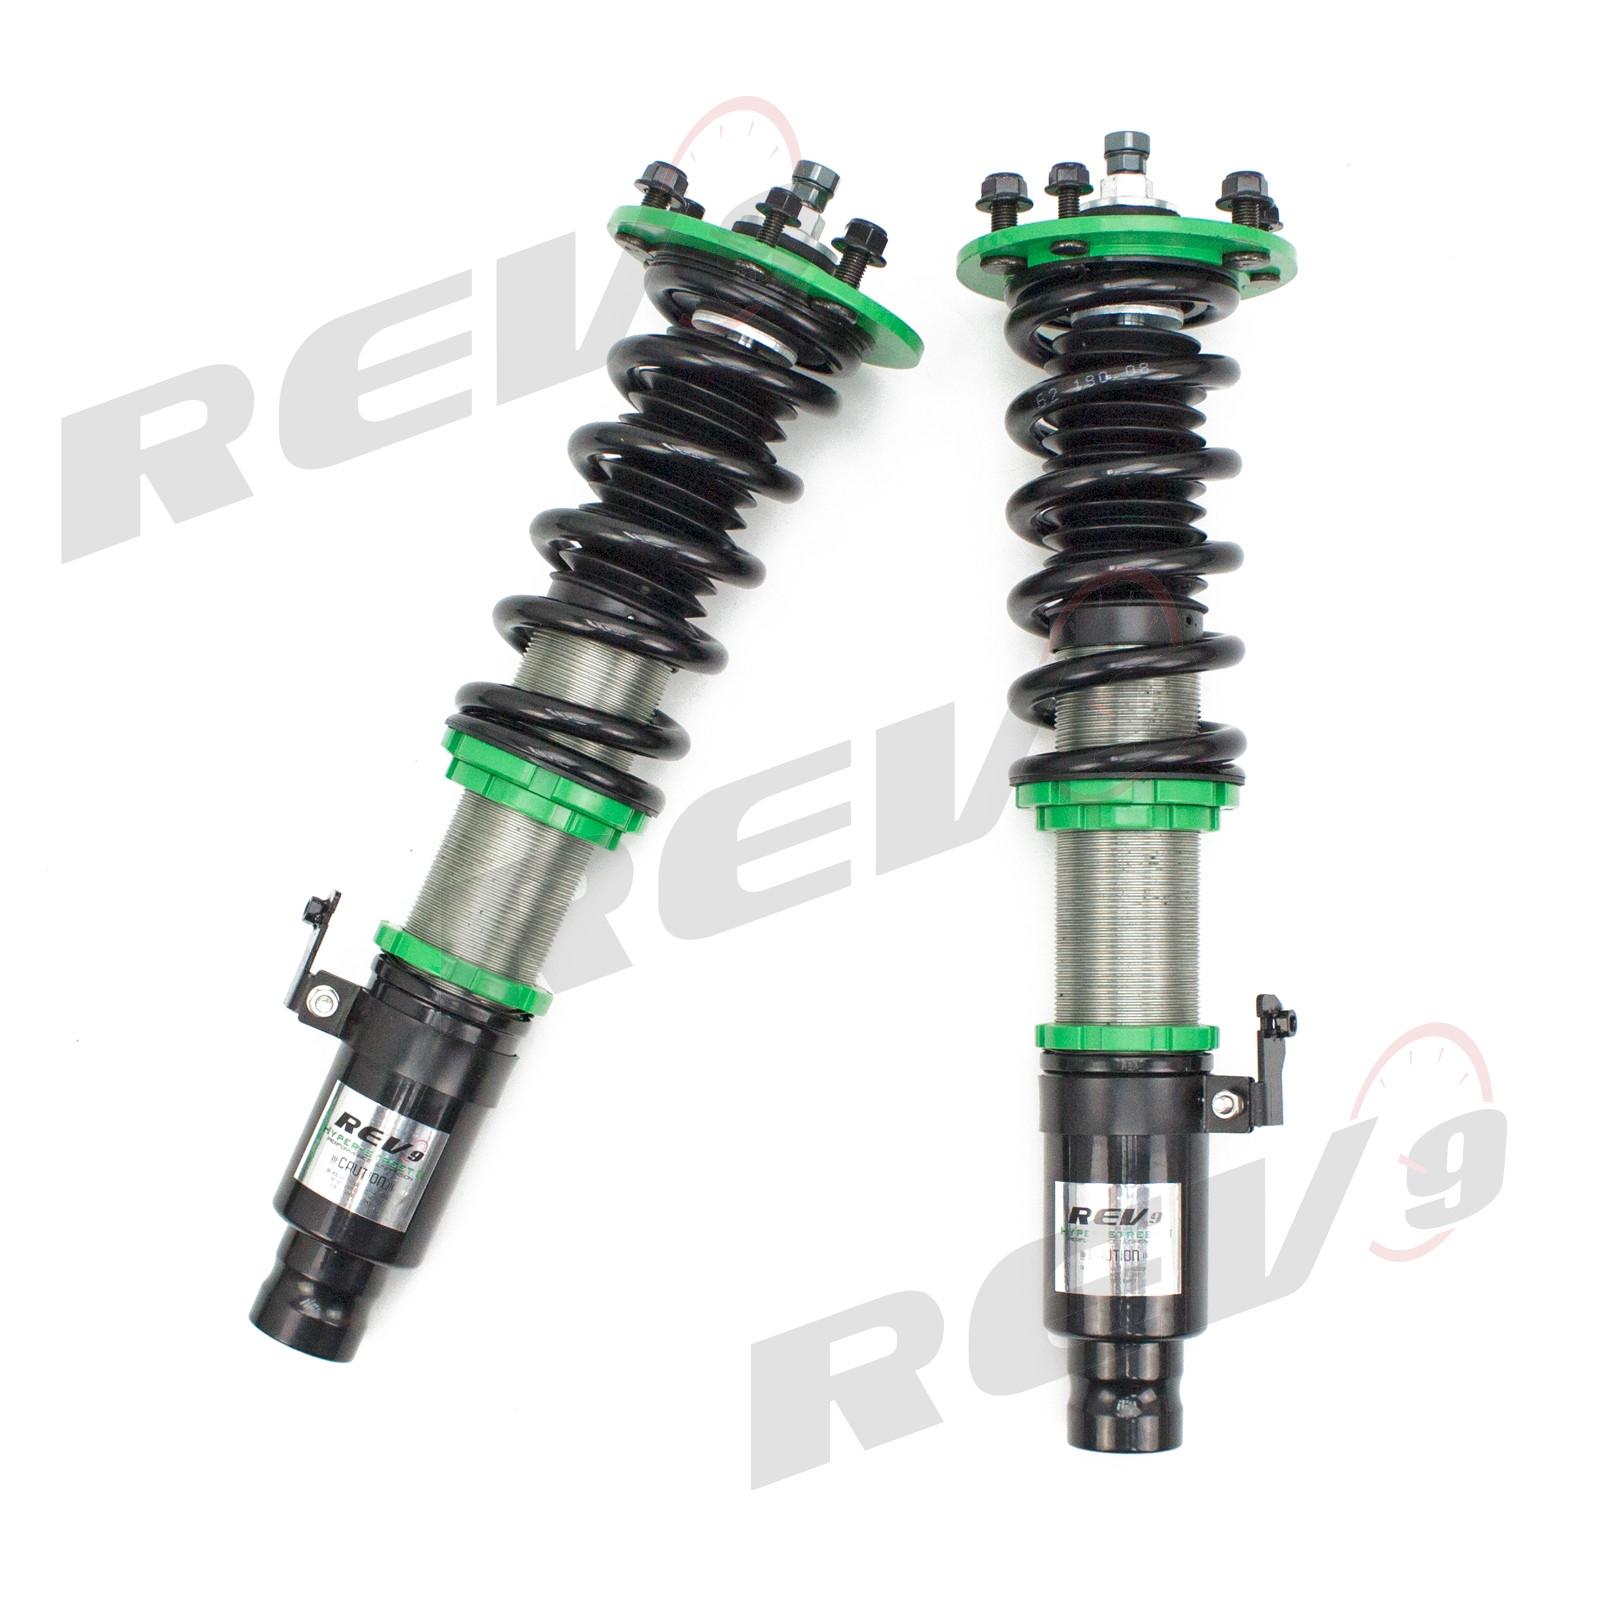 Rev9Power: Lowering Kit for Acura TL (UA8/UA9) 2009-14 ...